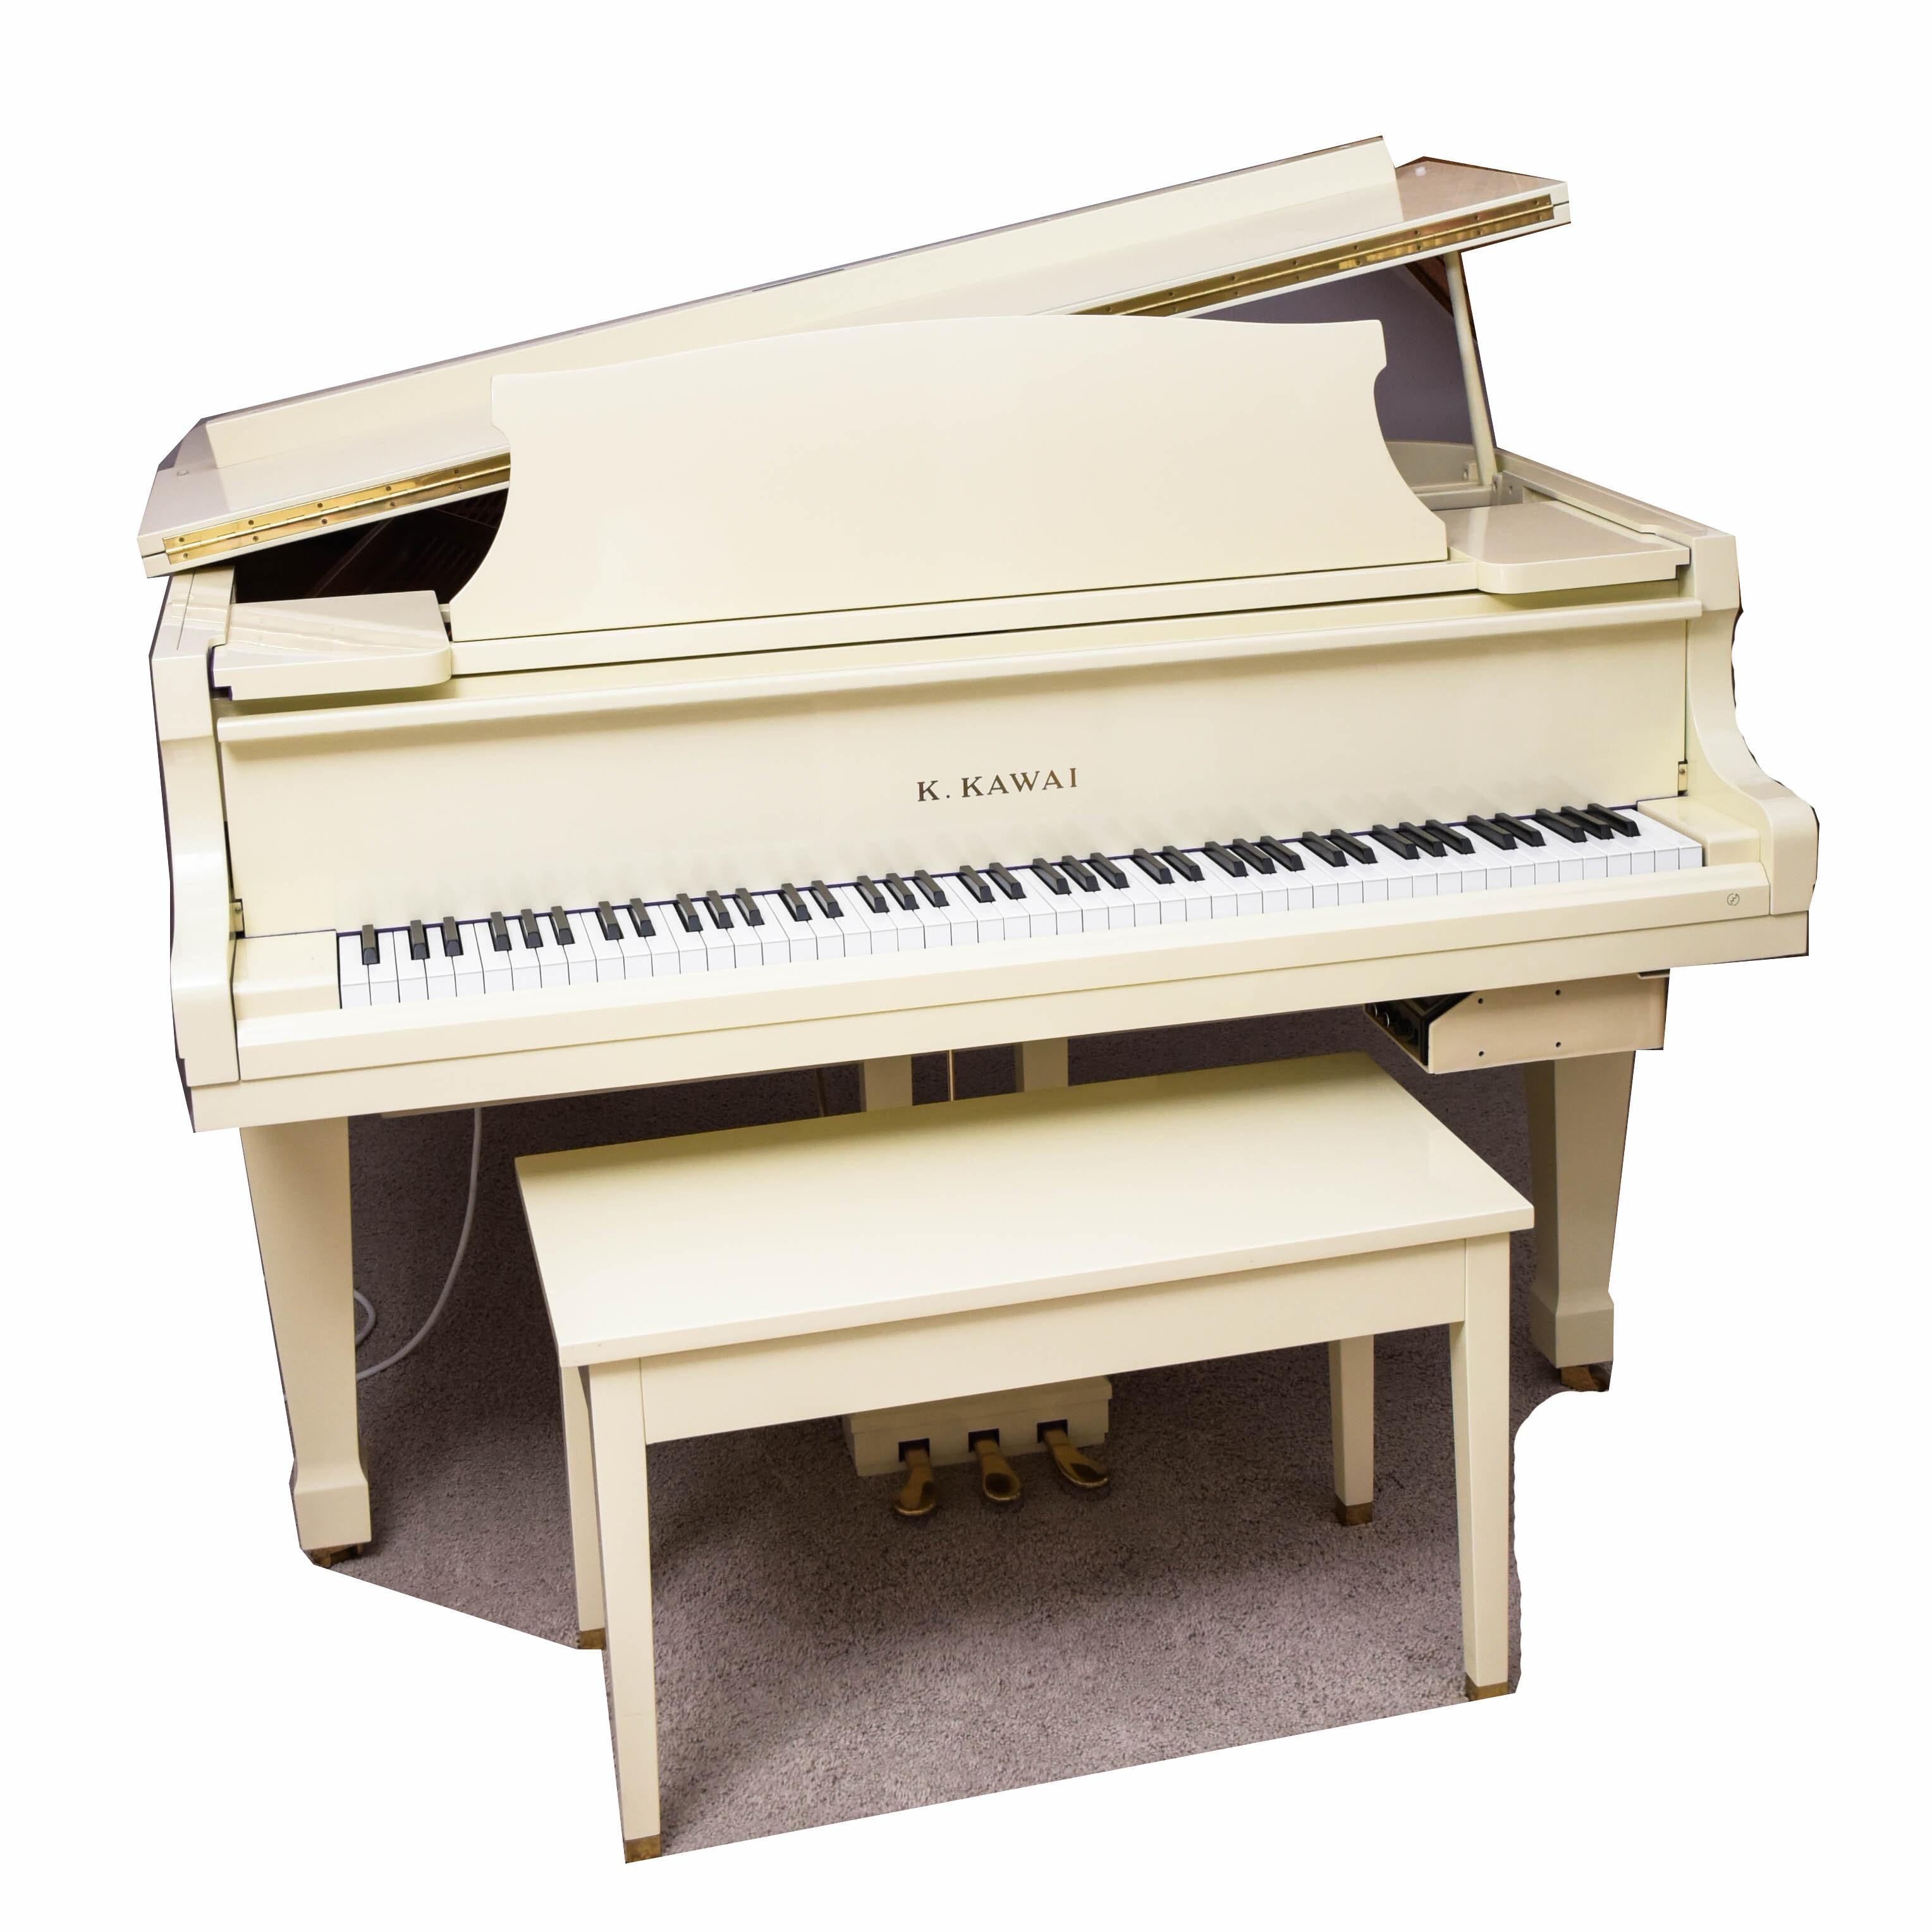 K. Kawai Grand Piano